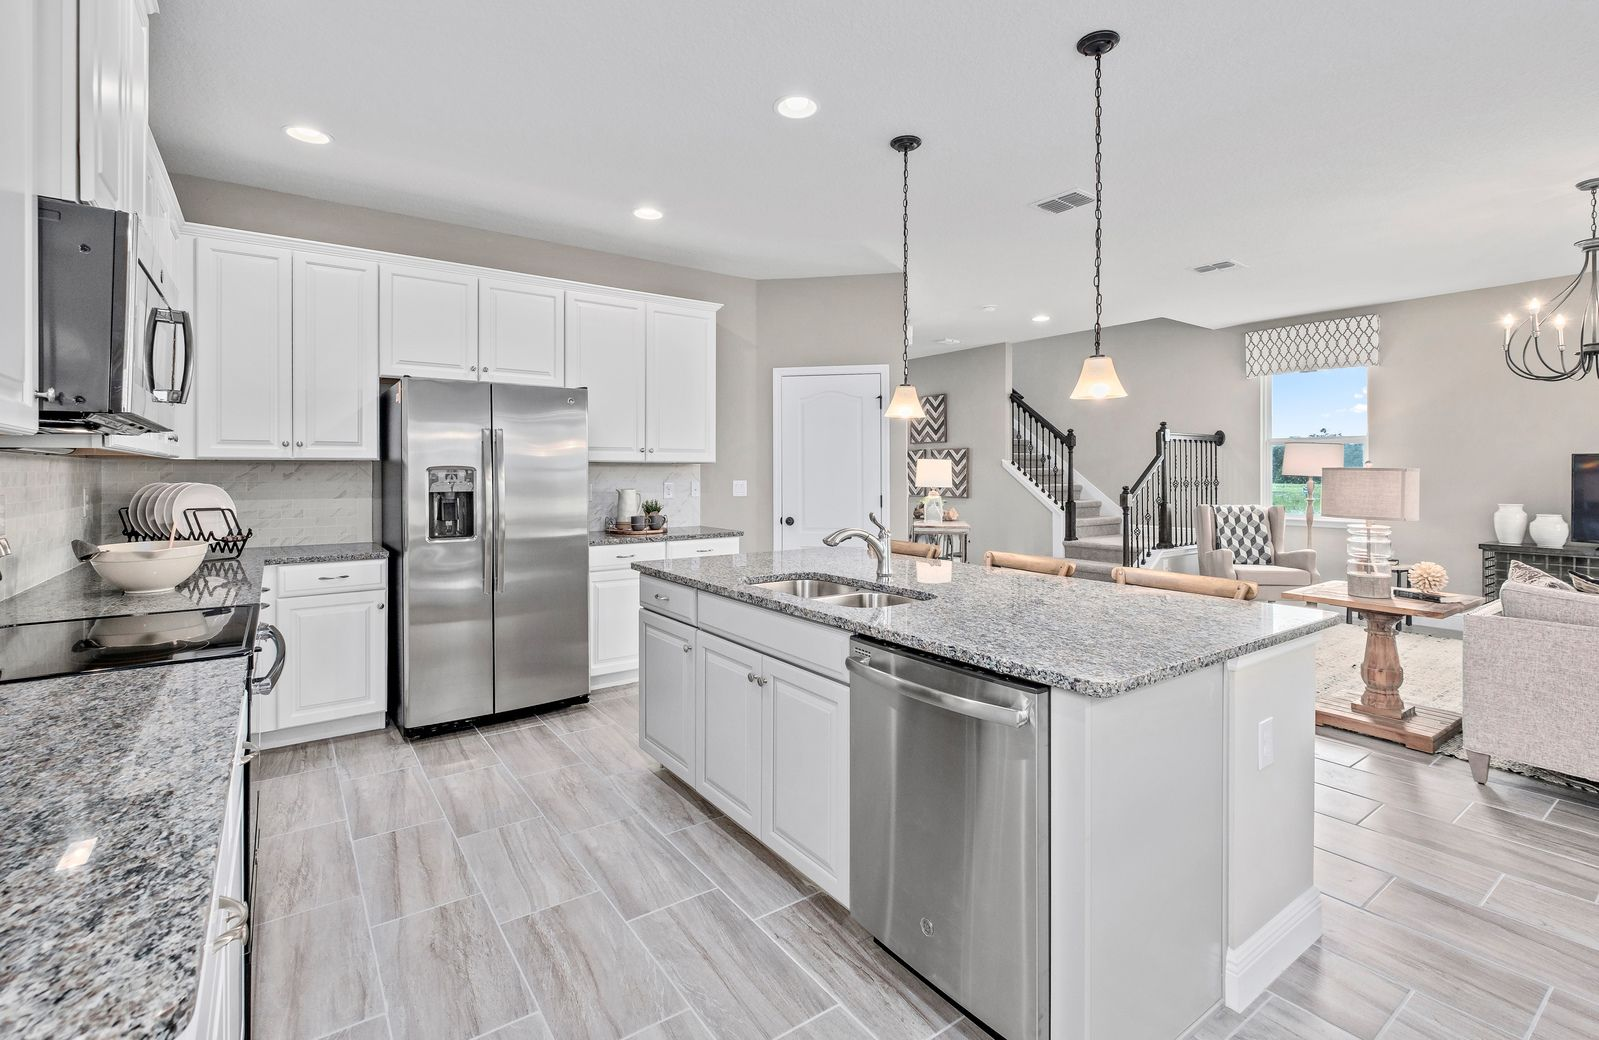 Kitchen featured in the Summerland By Ryan Homes in Orlando, FL